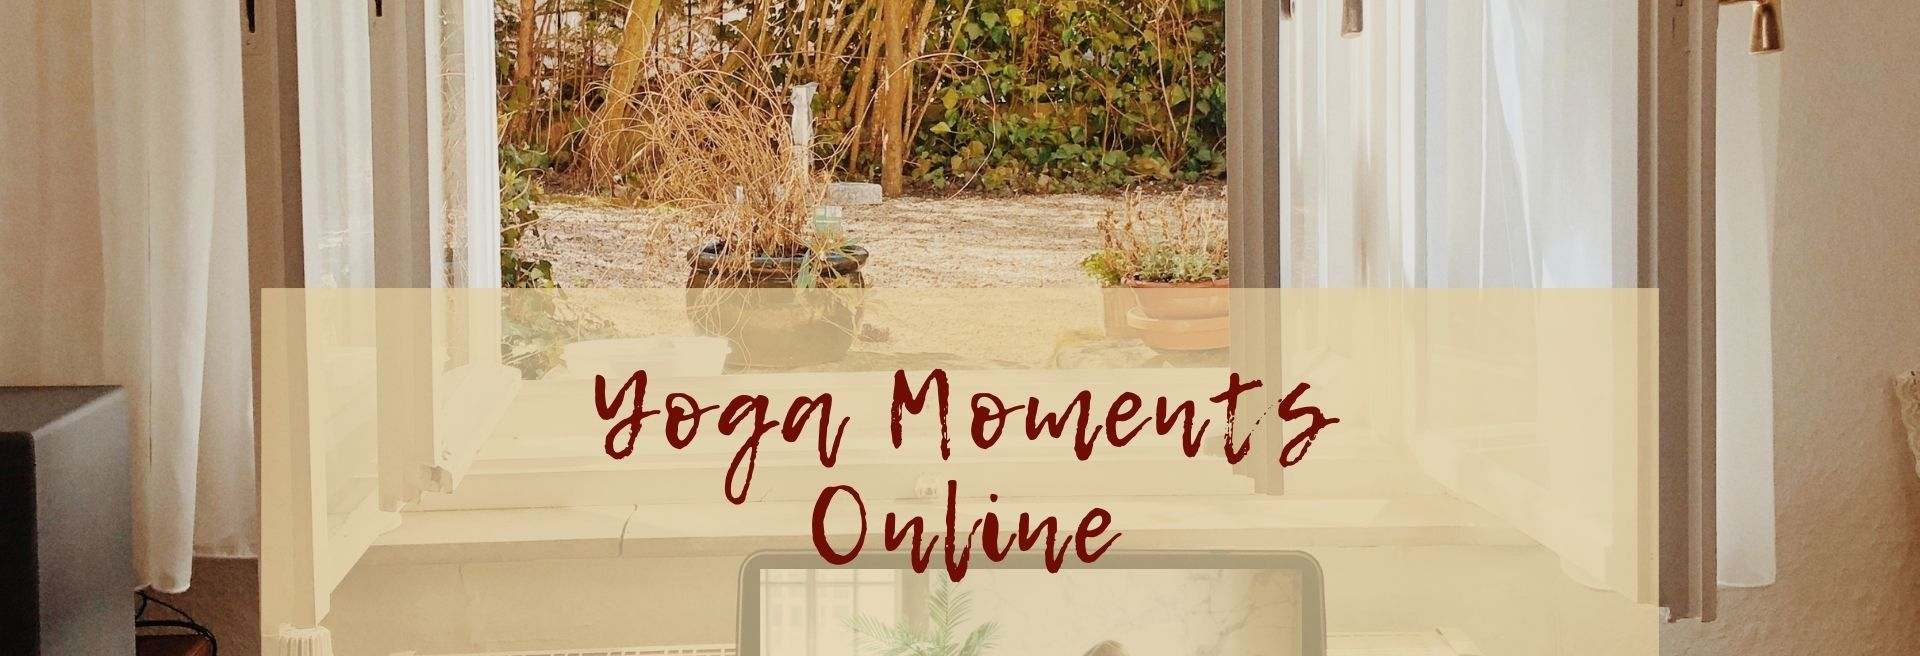 Yoga Moments online